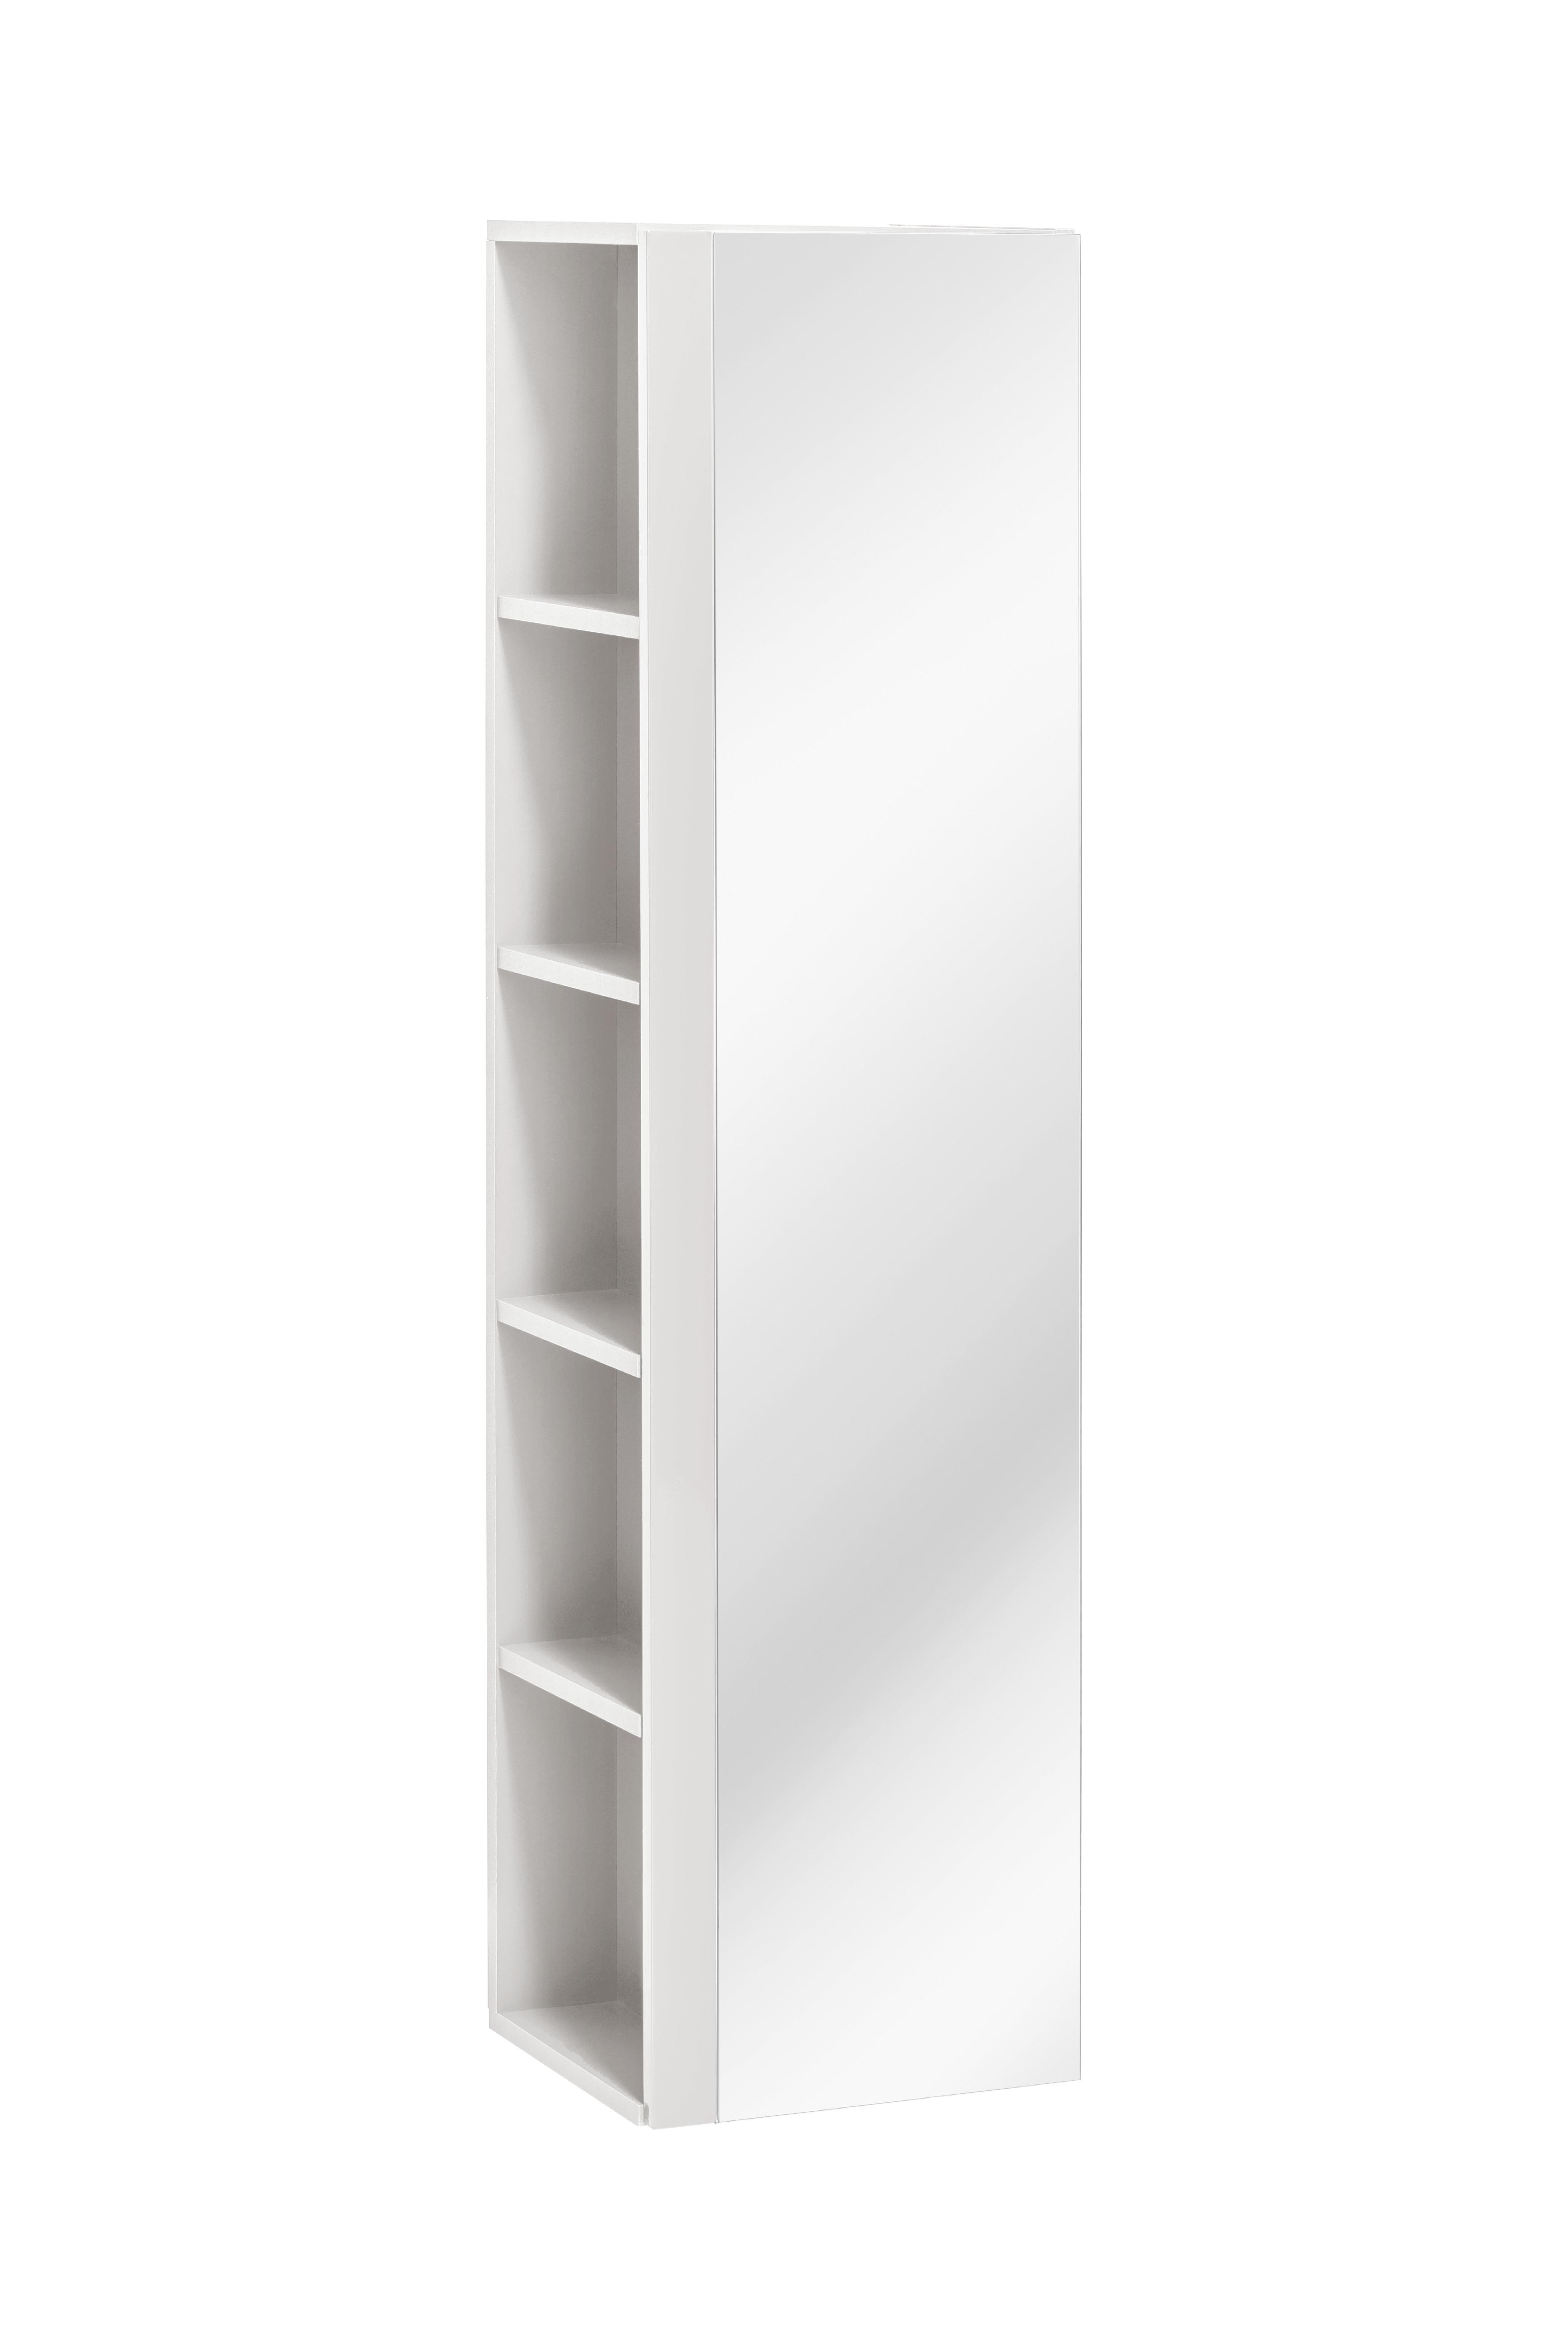 ArtCom Kúpeľňová zostava TWIST / BIELA Twist: skrinka vysoká Twist 802: 35 x 140 x 30 cm